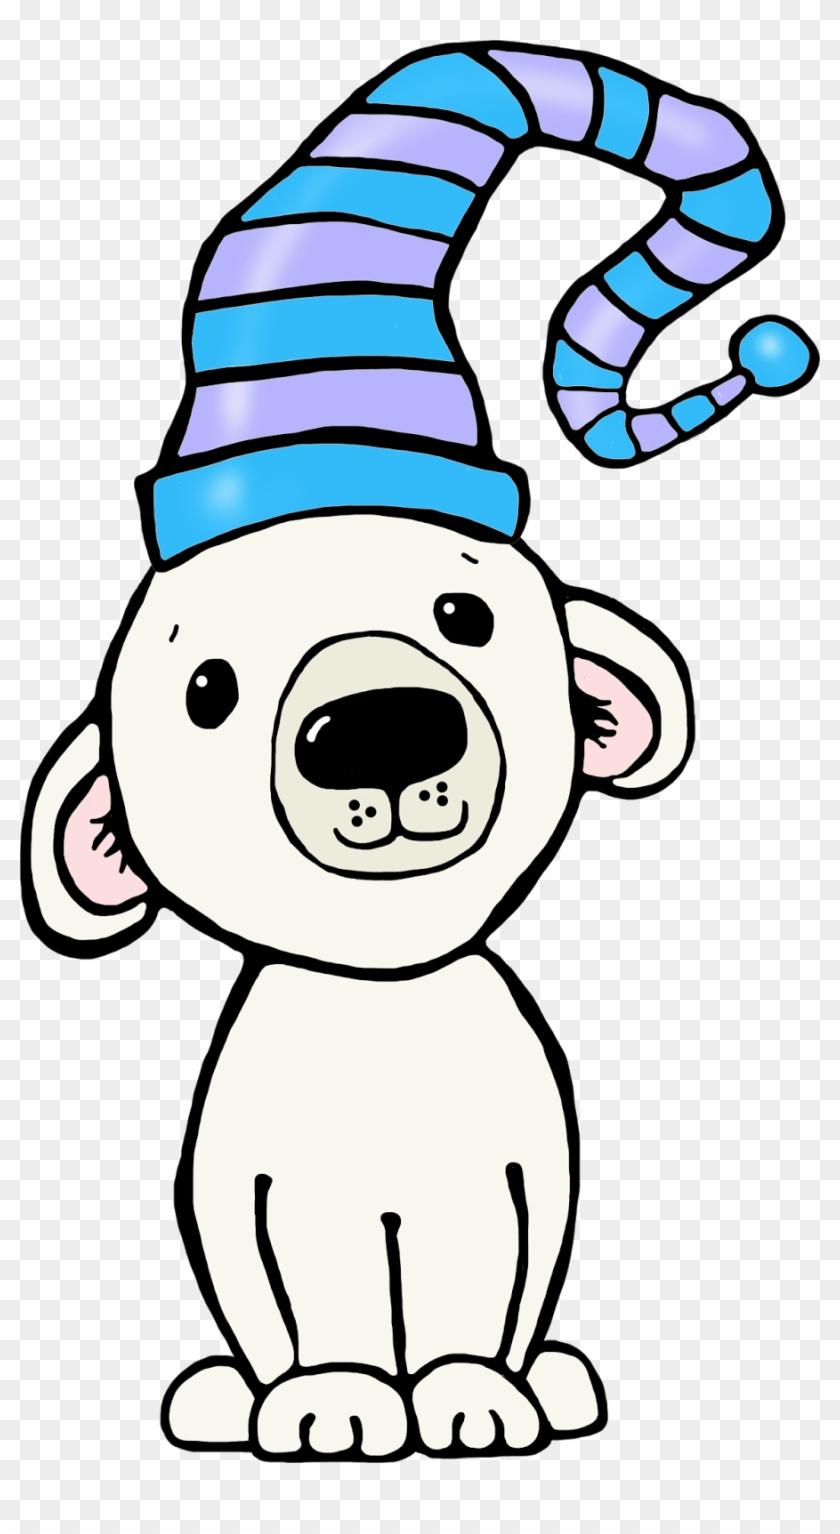 Whimsical Christmas Clip Art Whimsy Workshop Teaching - Polar Bears And Penguins Clipart #22853